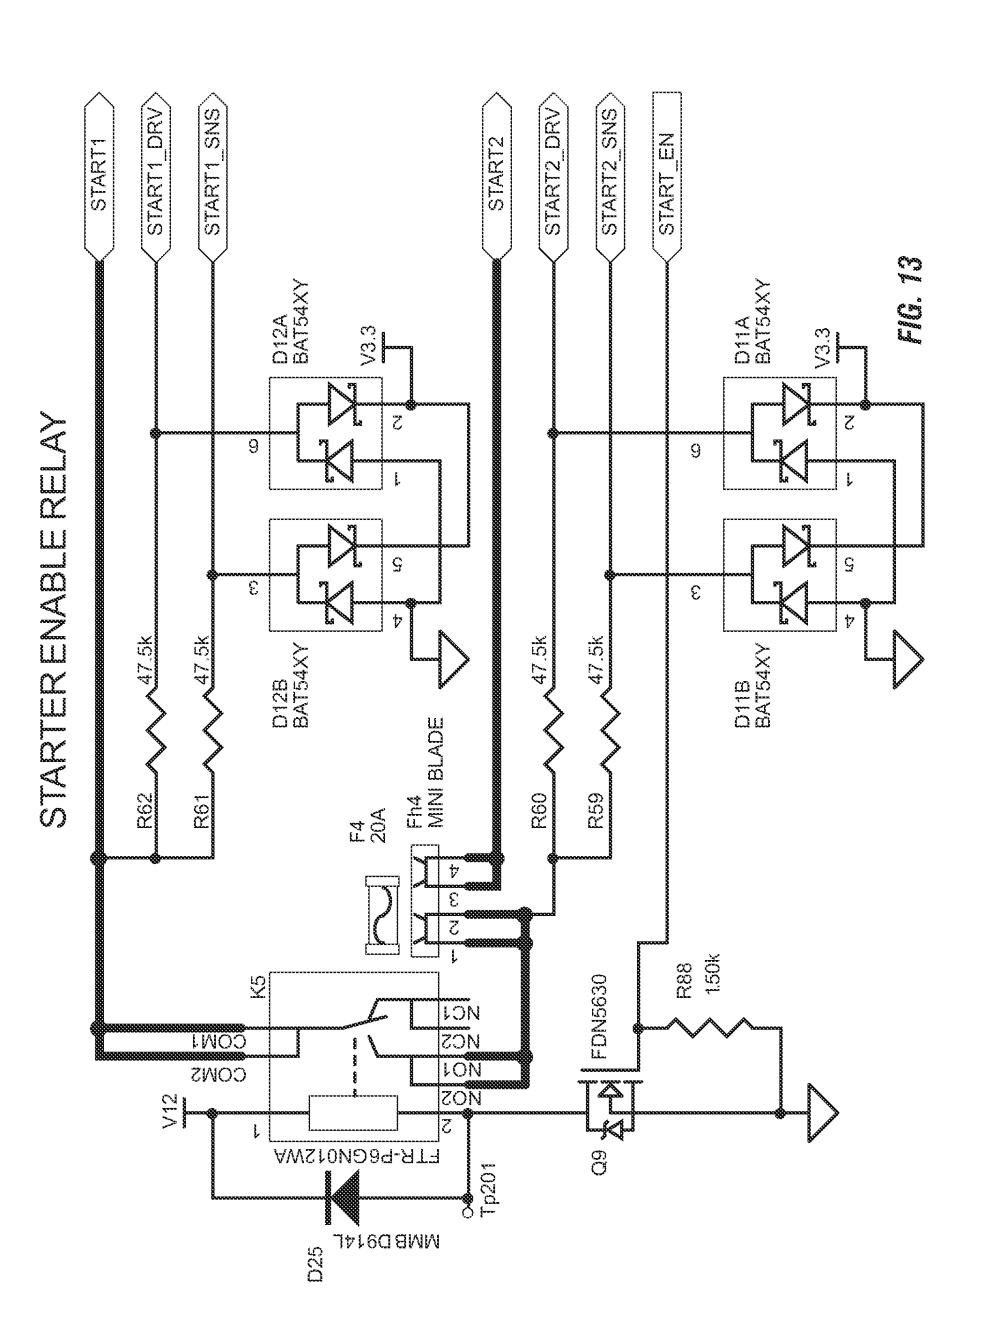 medium resolution of wiring diagram for smart start interlock wiring diagrams konsultwiring diagram for smart start interlock wiring diagram